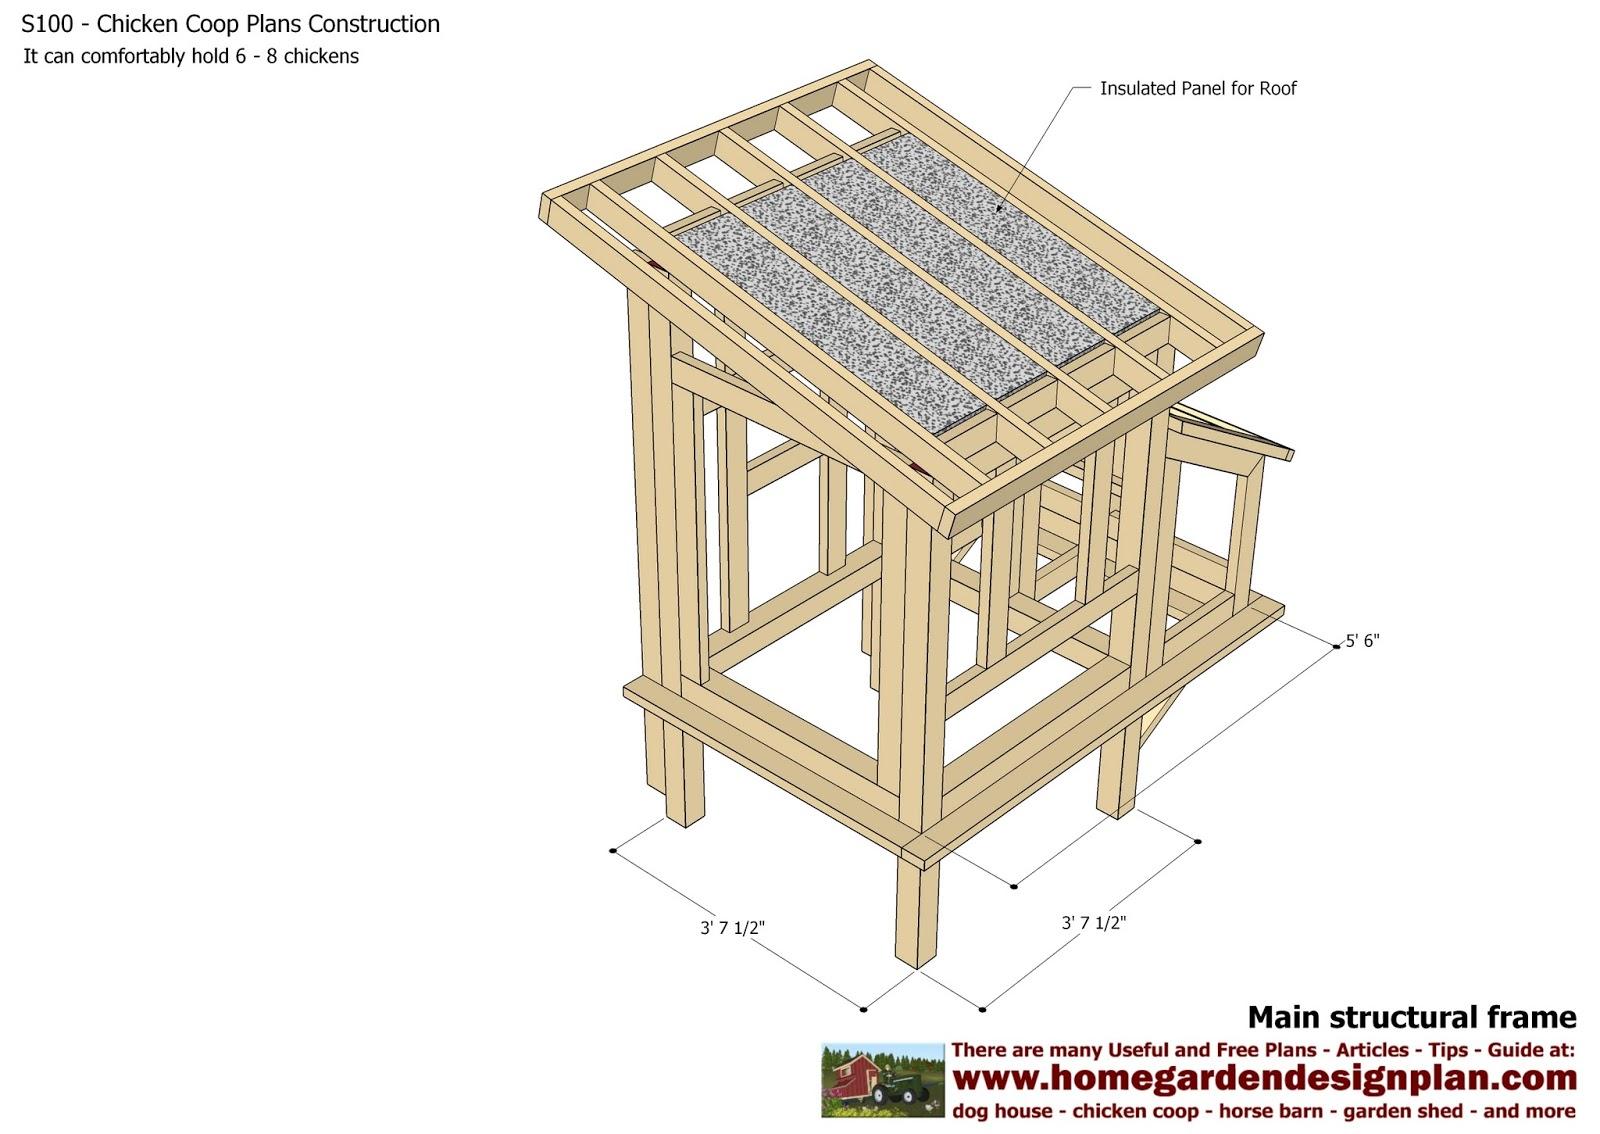 S300 - Chicken Coop Plans Construction - Chicken Coop Design - How To ...